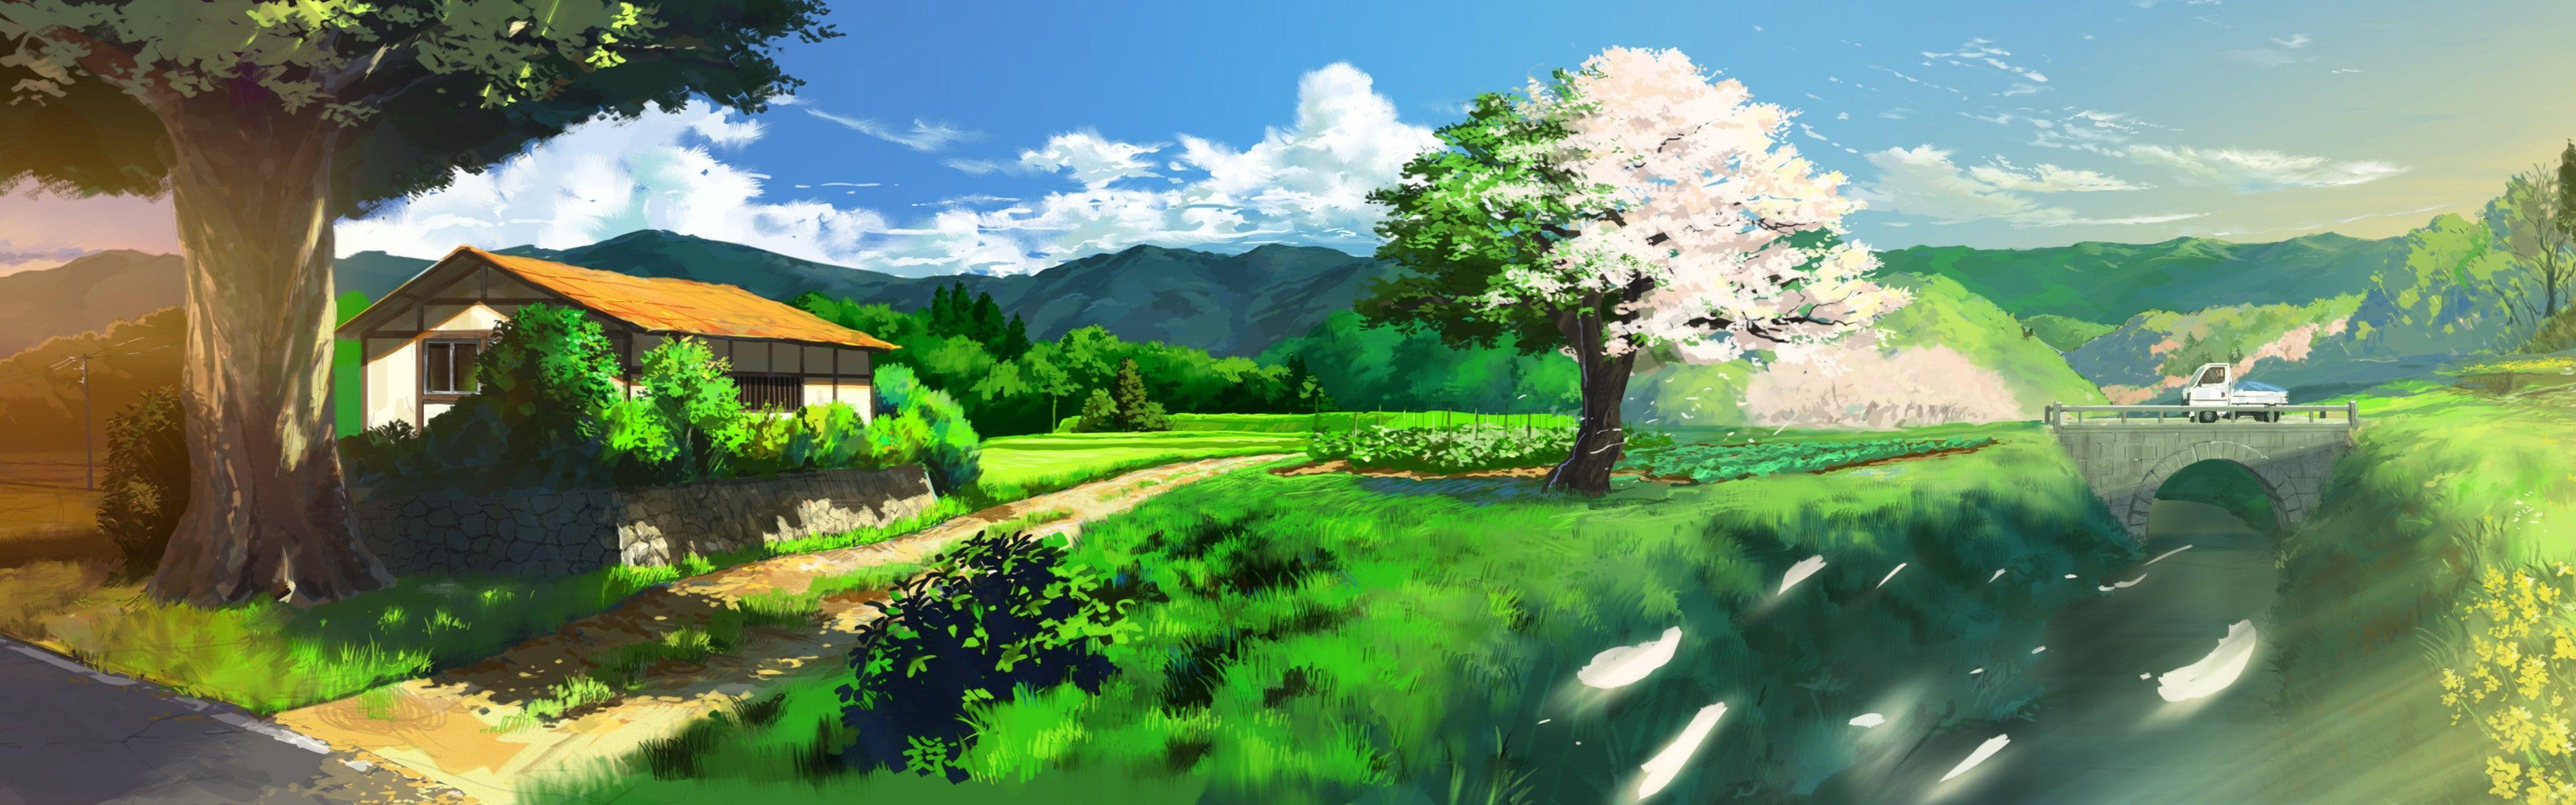 Anime Landscape Nature Peace Peaceful 4k Wallpaper Hdwallpaper Desktop Background Landscape Landscape Wallpaper Anime Scenery Backgrounds 31 anime landscape wallpaper